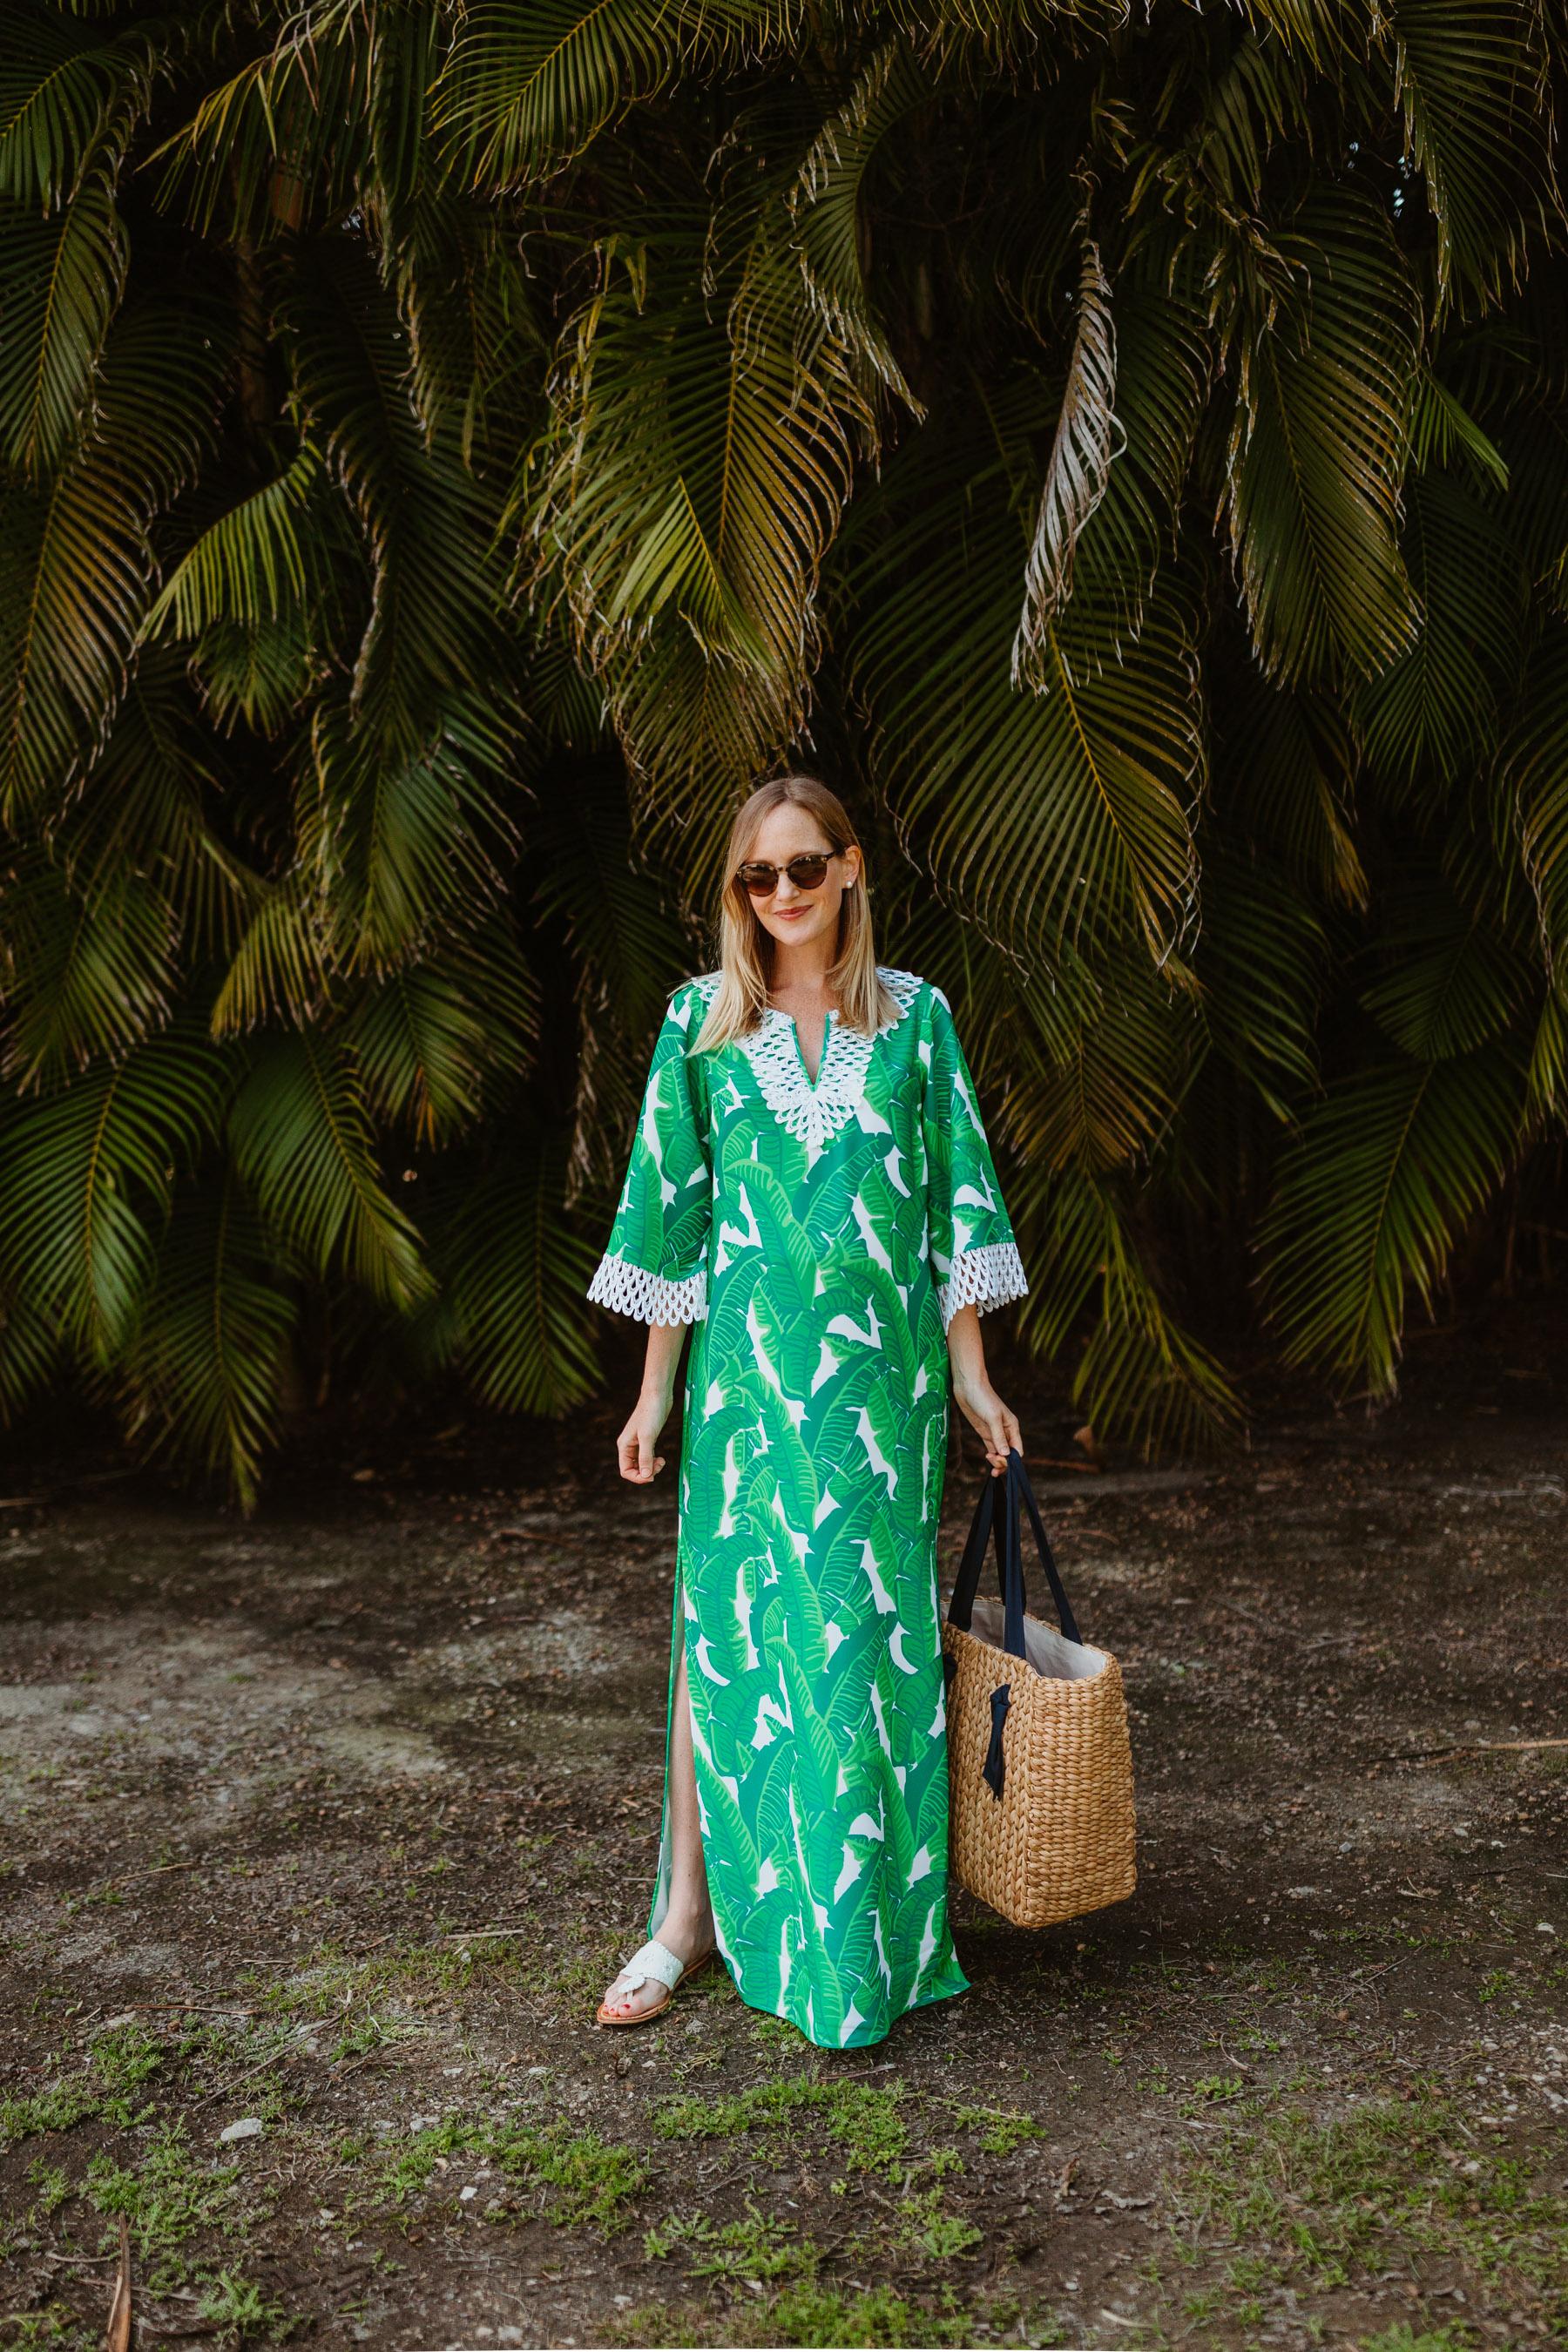 Banana Leaf Palm Dress